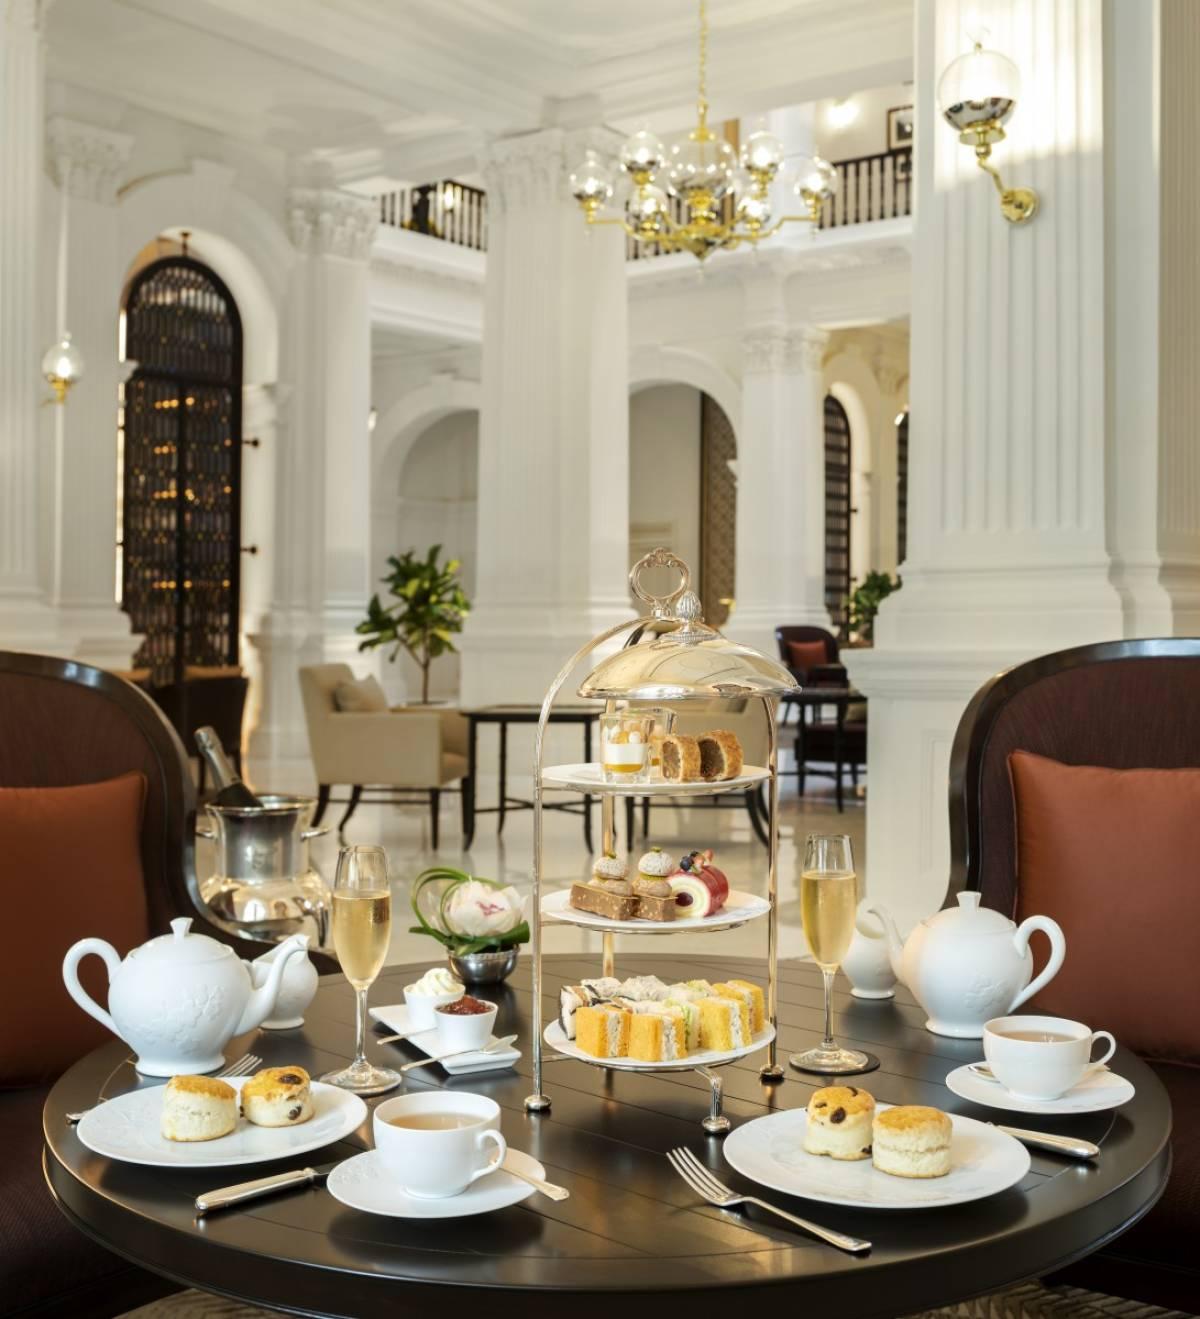 CELEBRATE VALENTINE'S DAY WITH ROMANTIC INDULGENCES AT RAFFLES HOTEL SINGAPORE